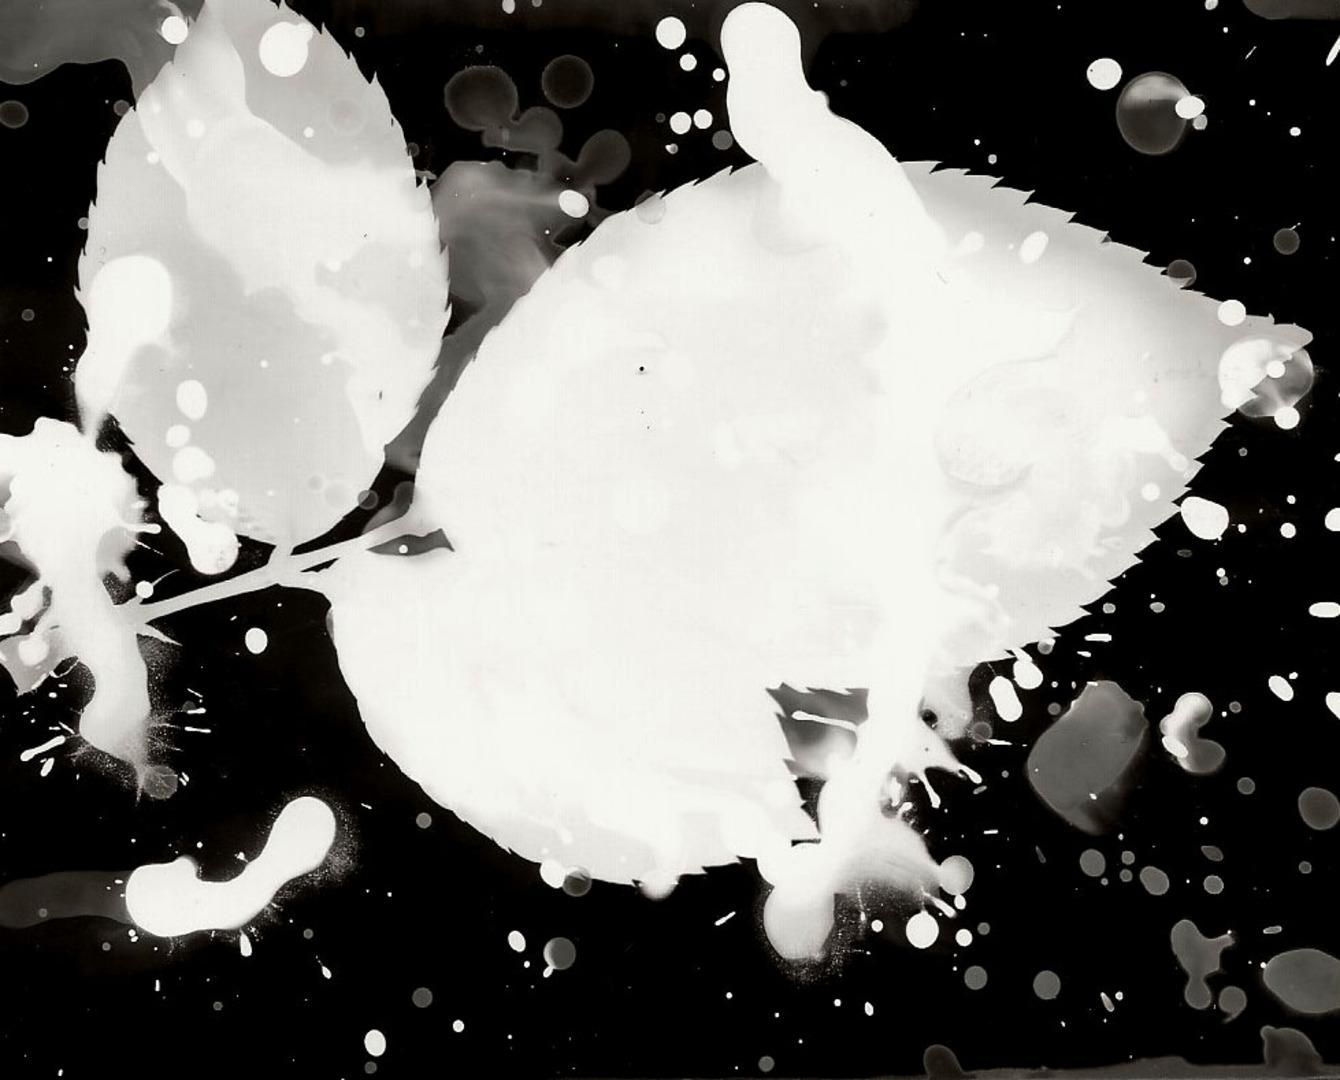 Work by Eden Atherton-Kelly